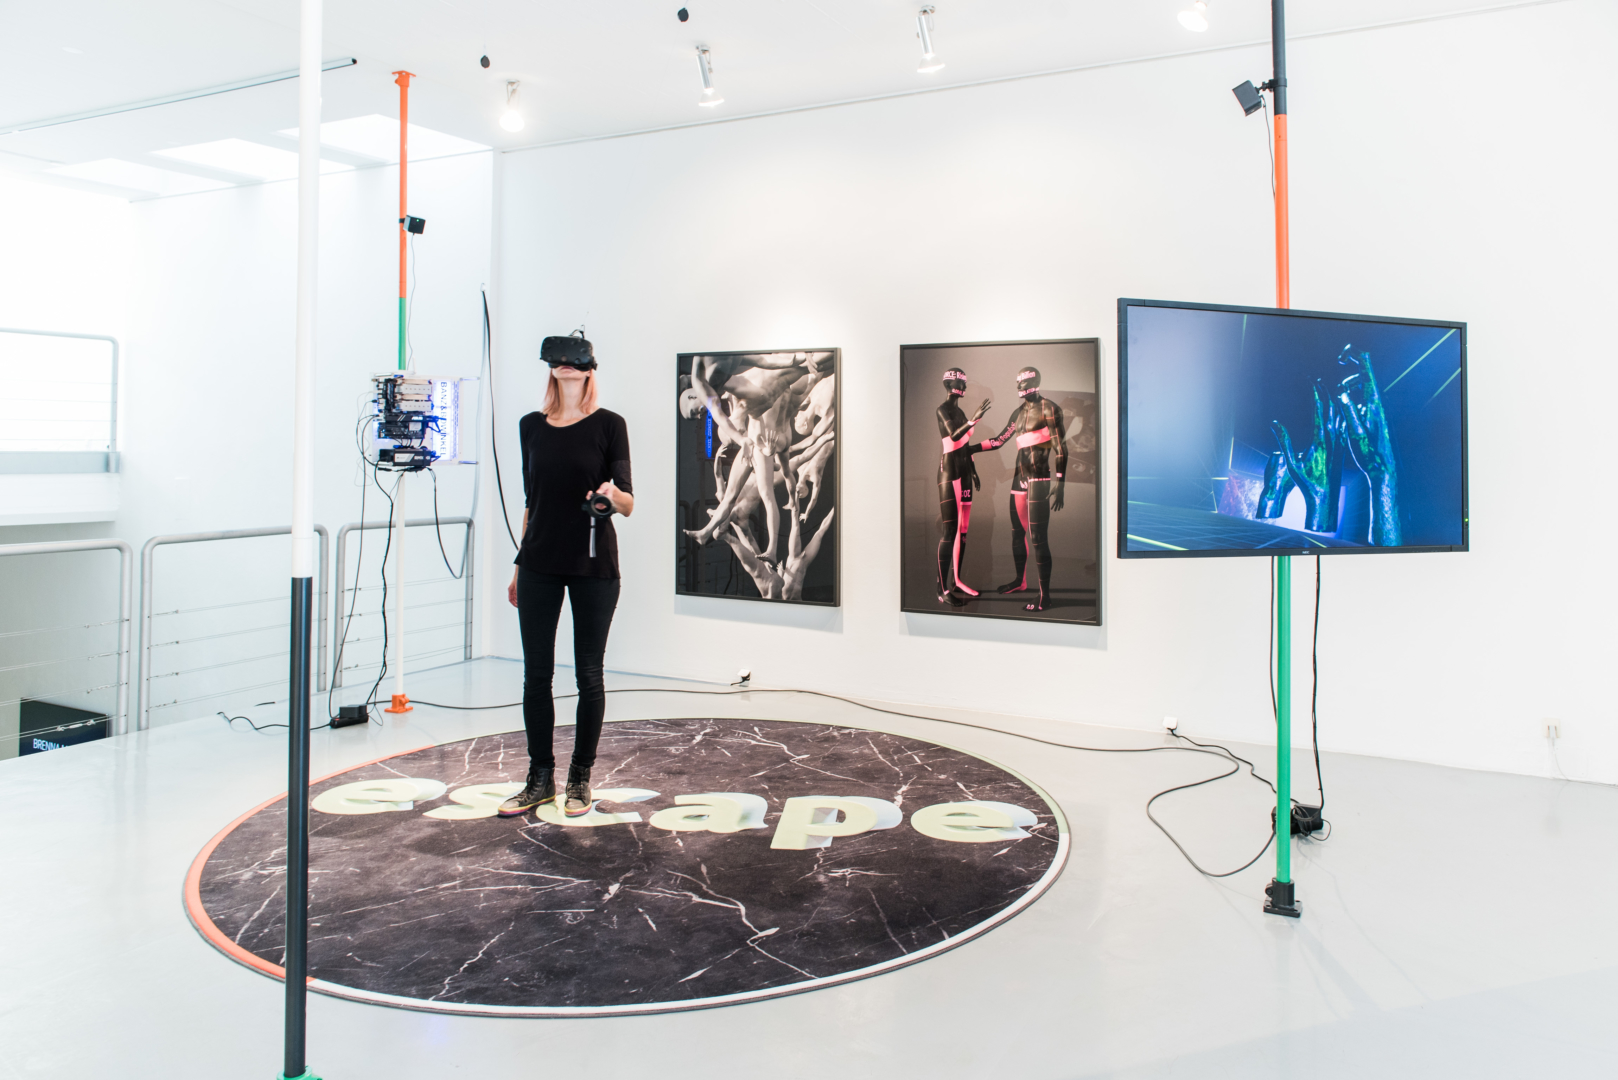 D Virtual Reality Exhibition : Banz bowinkel palo alto vr experience reset iii